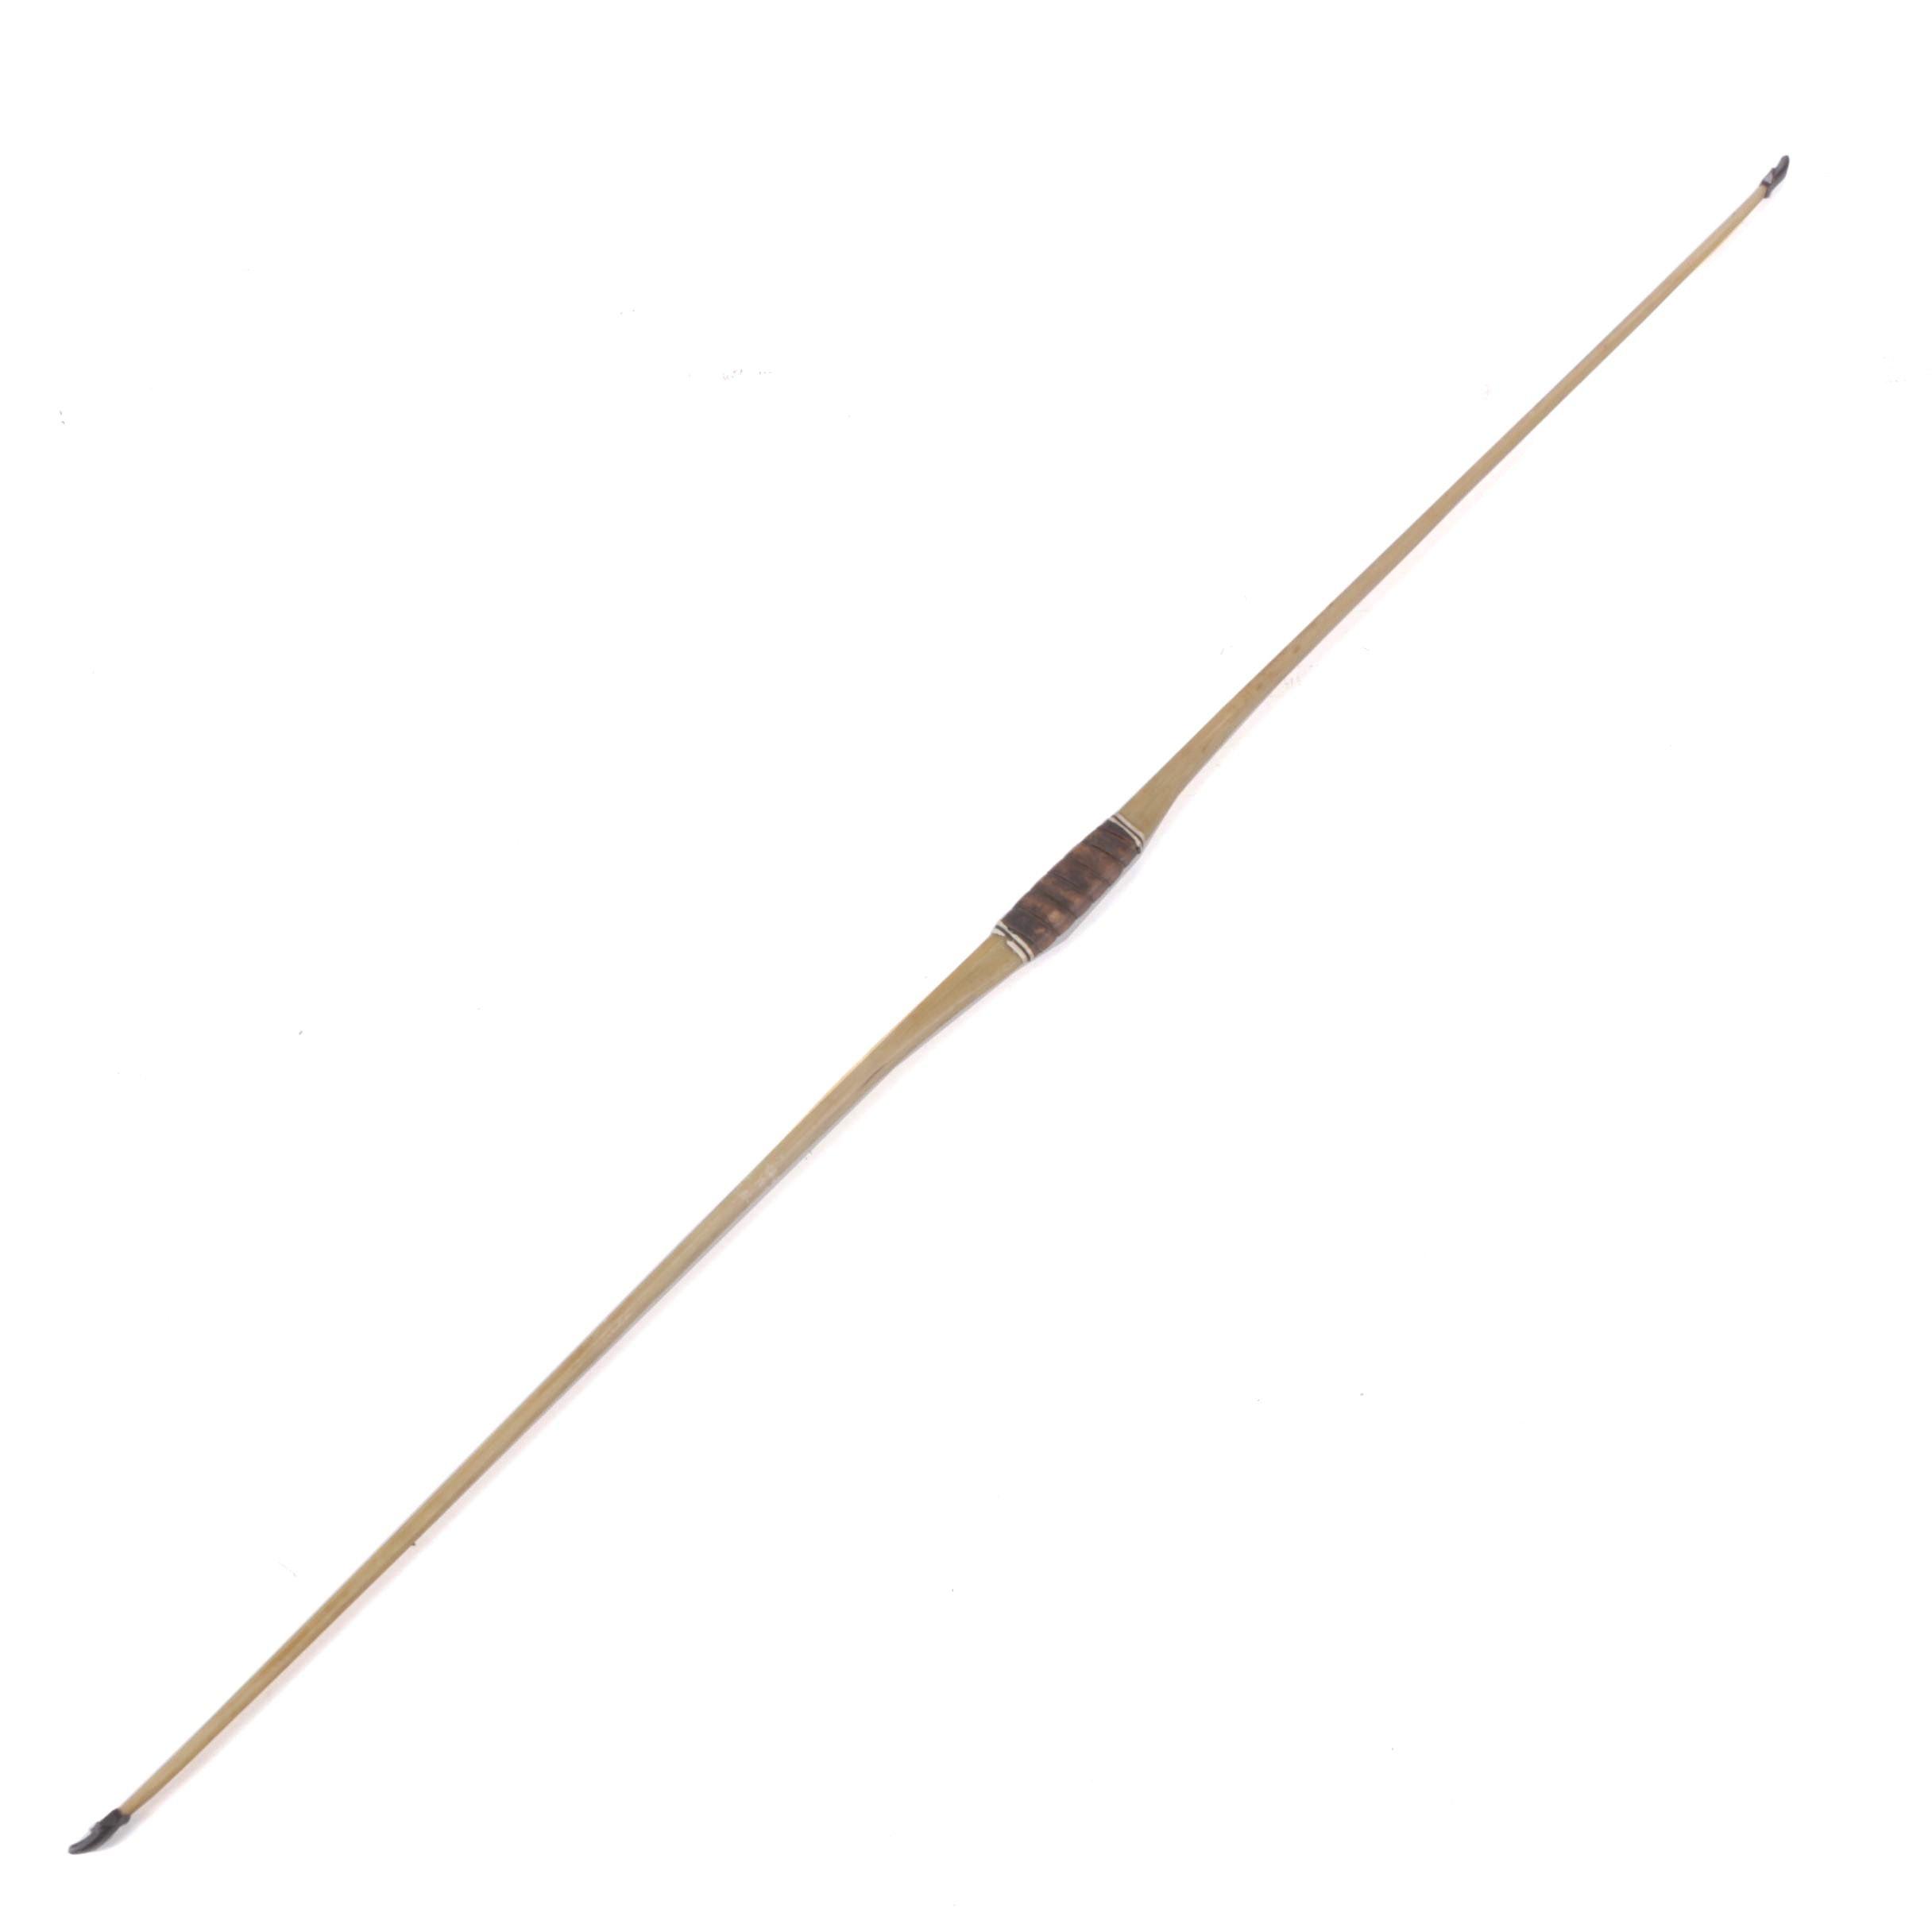 Fiberglass Longbow with Nocks